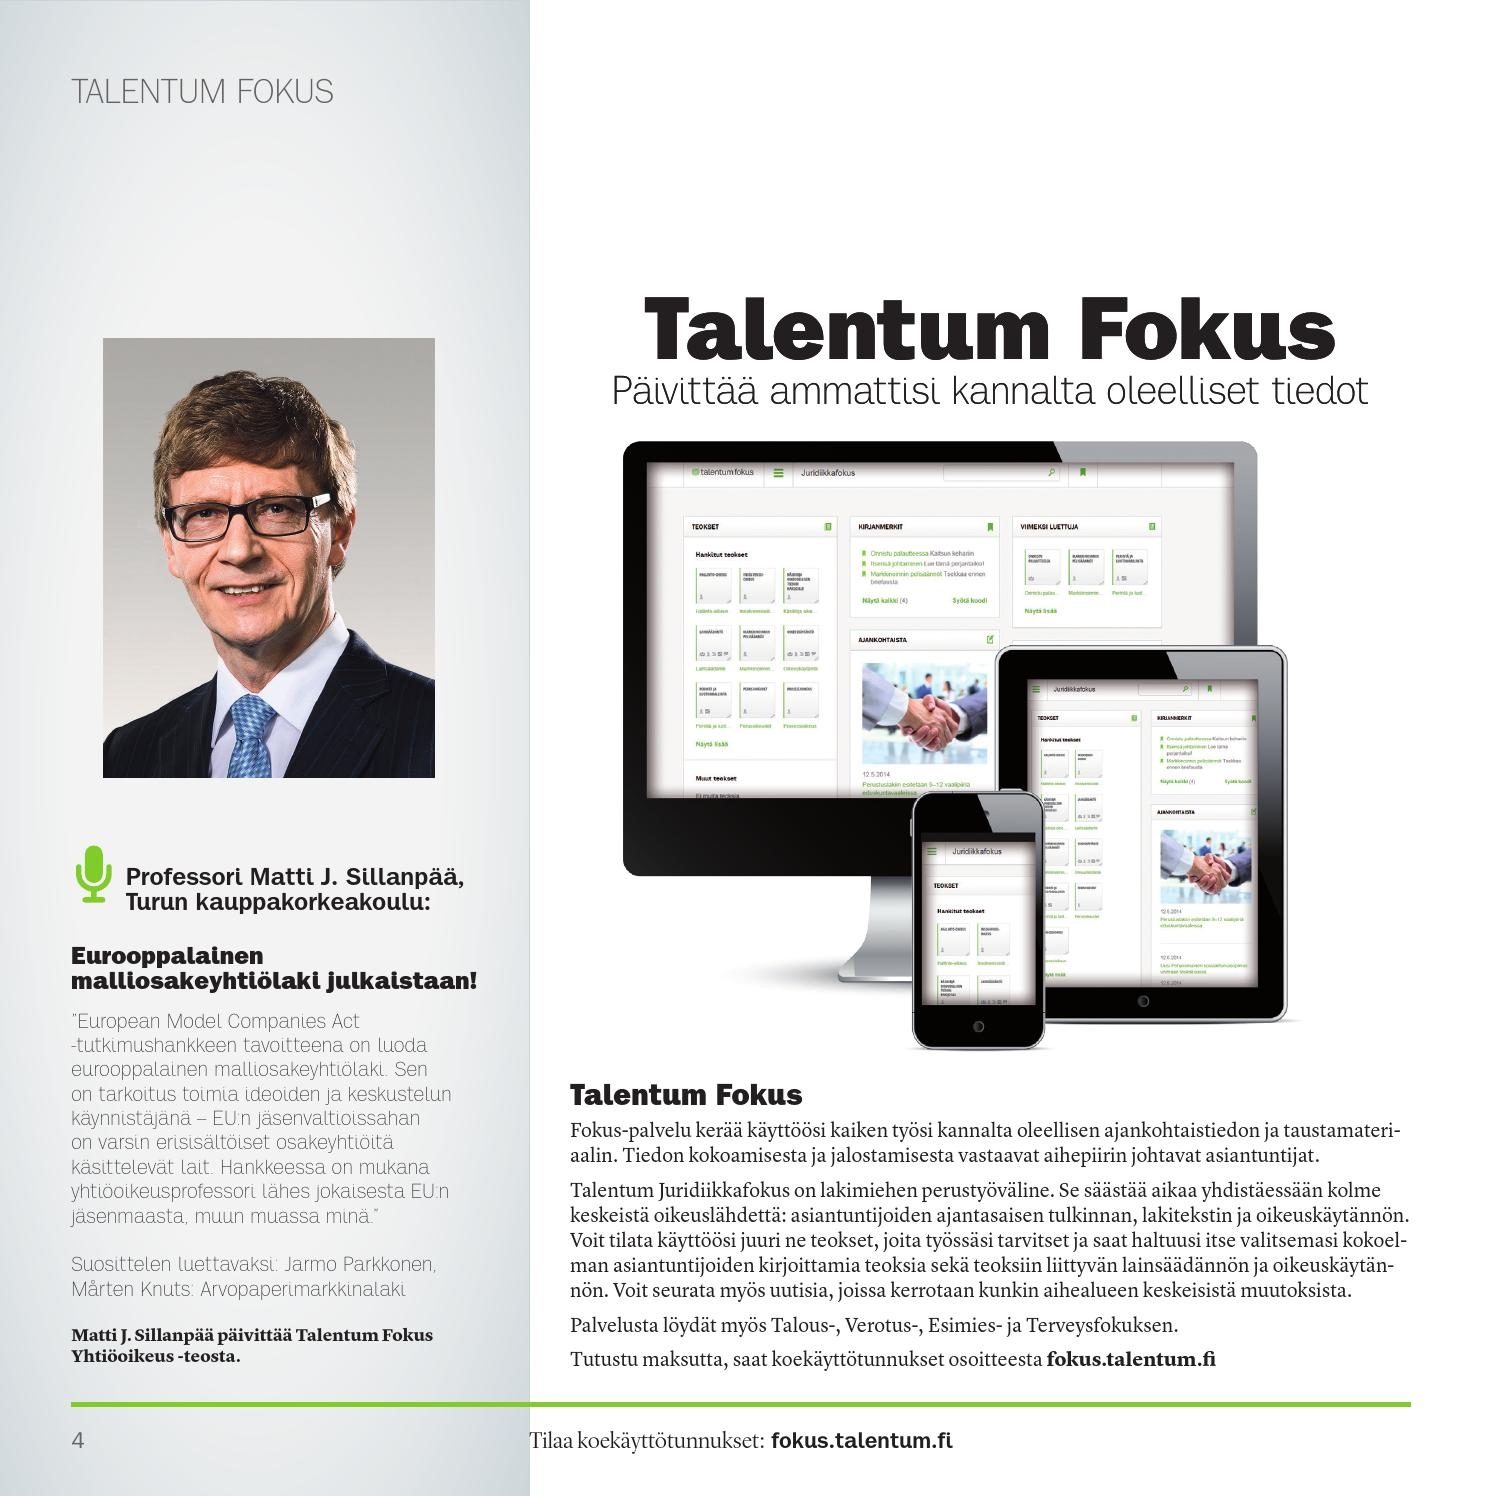 Talentum Fokus